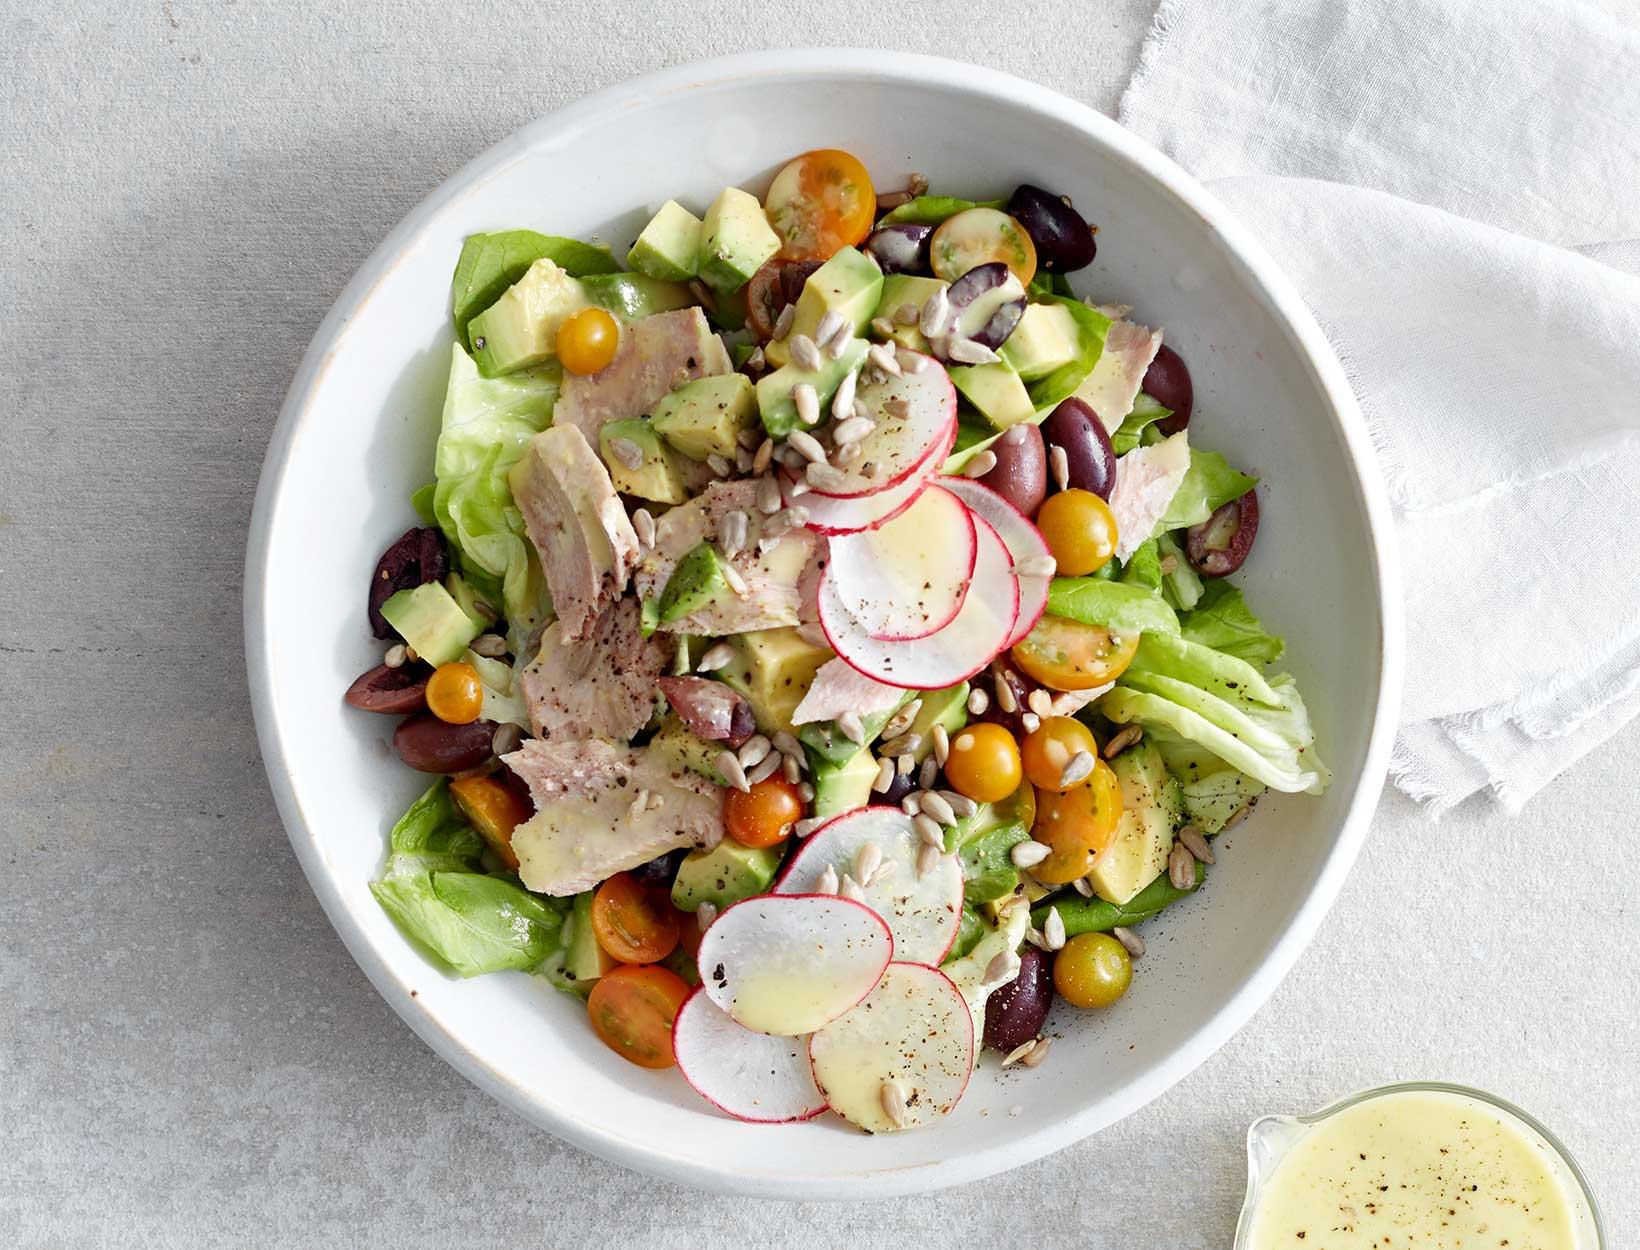 Bibb, Avocado, and Tuna Salad with Tarragon DijonDressing